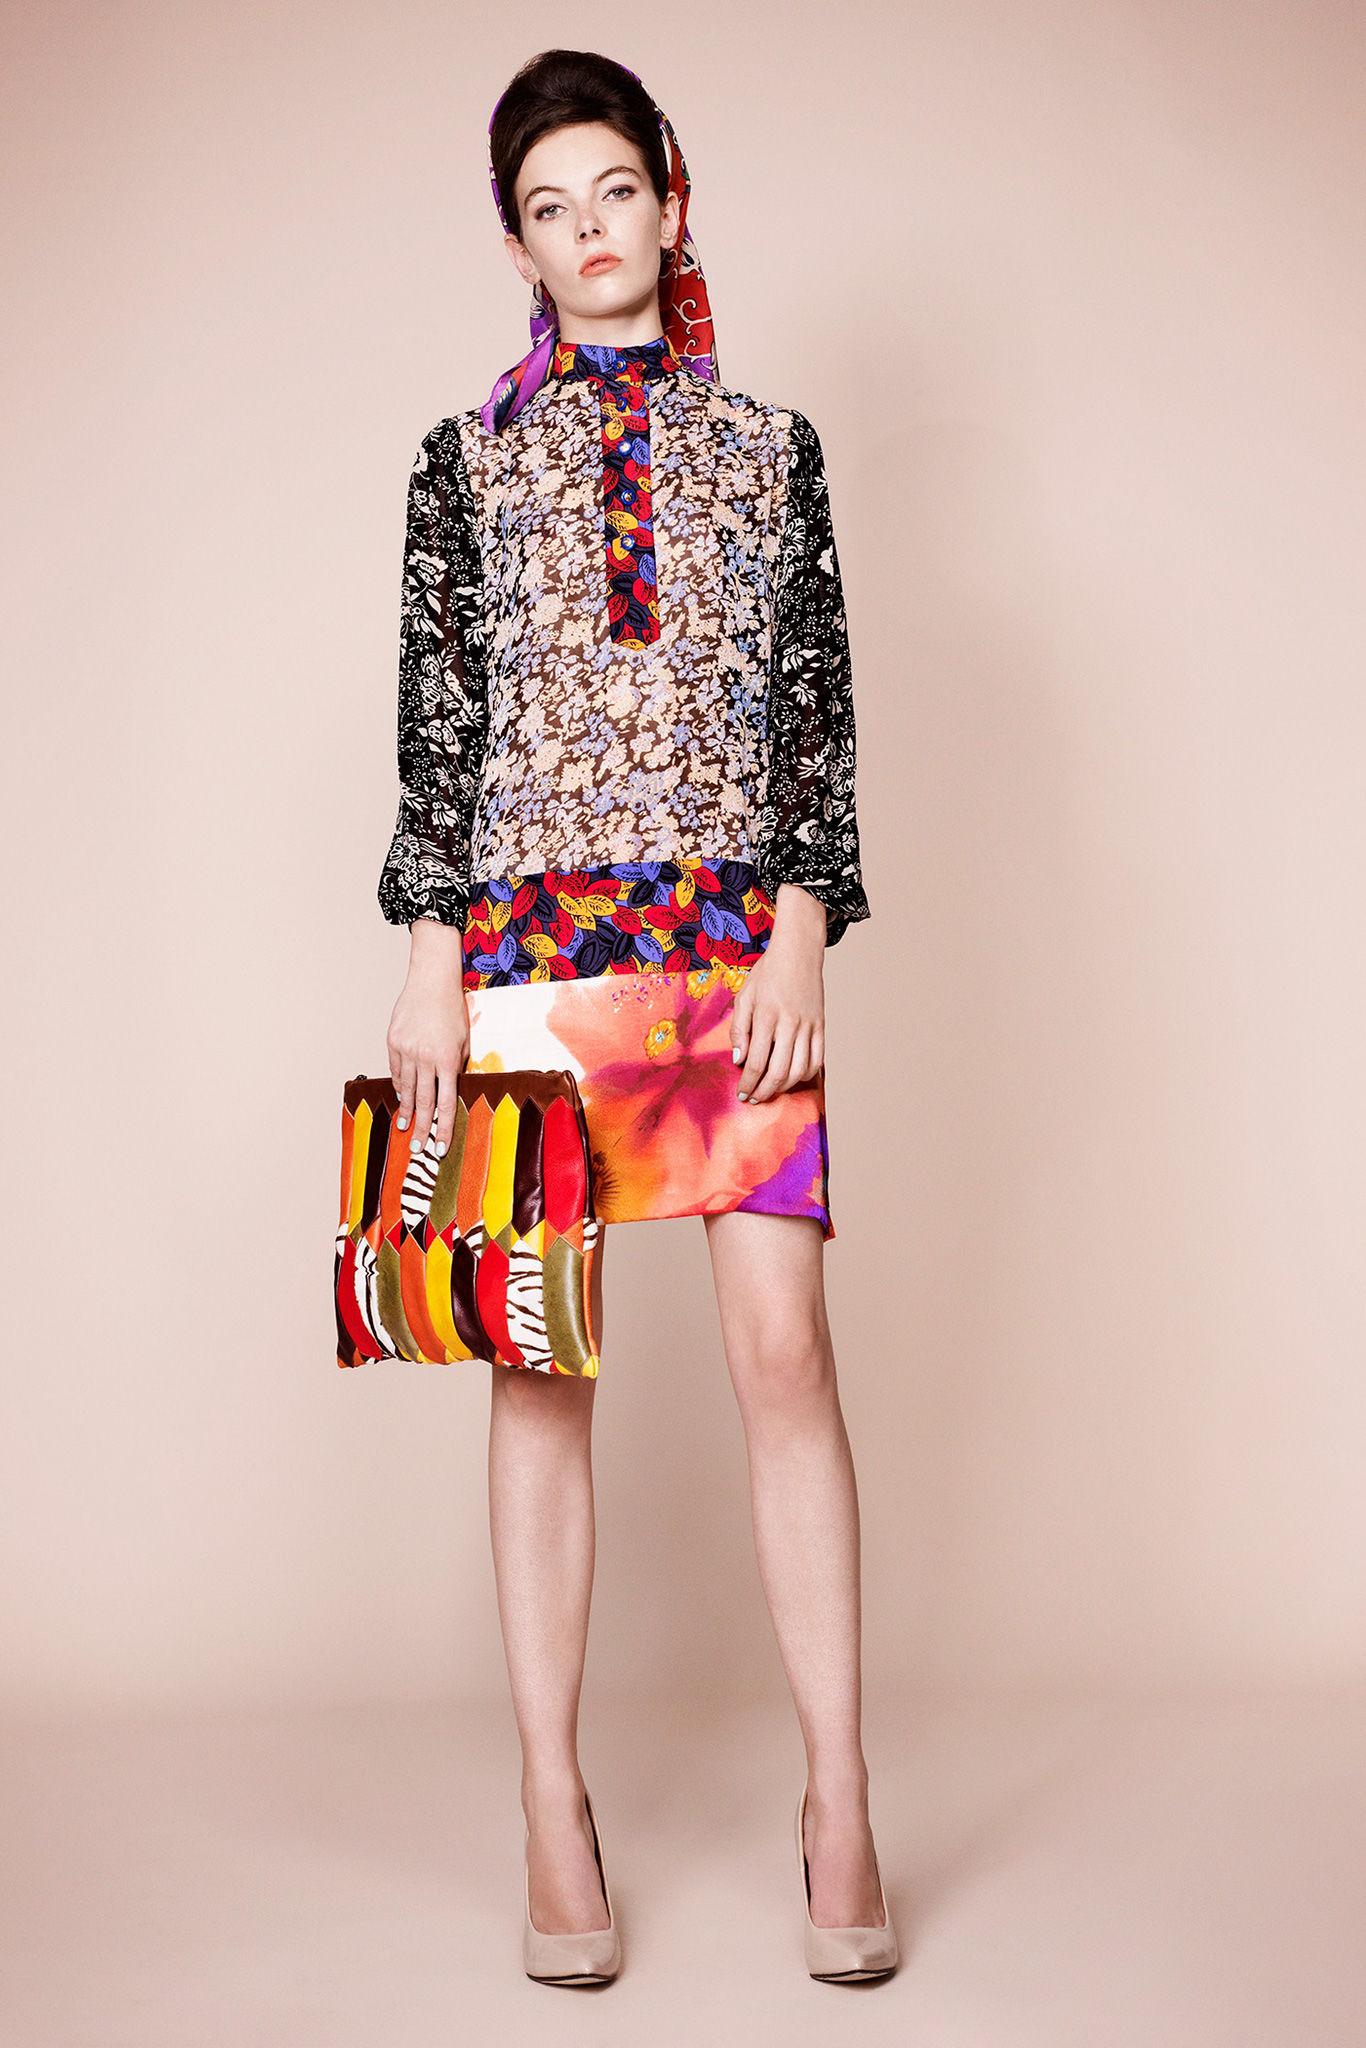 https://i2.wp.com/fashionbombdaily.com/wp-content/uploads/2012/09/duro-olowu-spring-2013-7.jpg